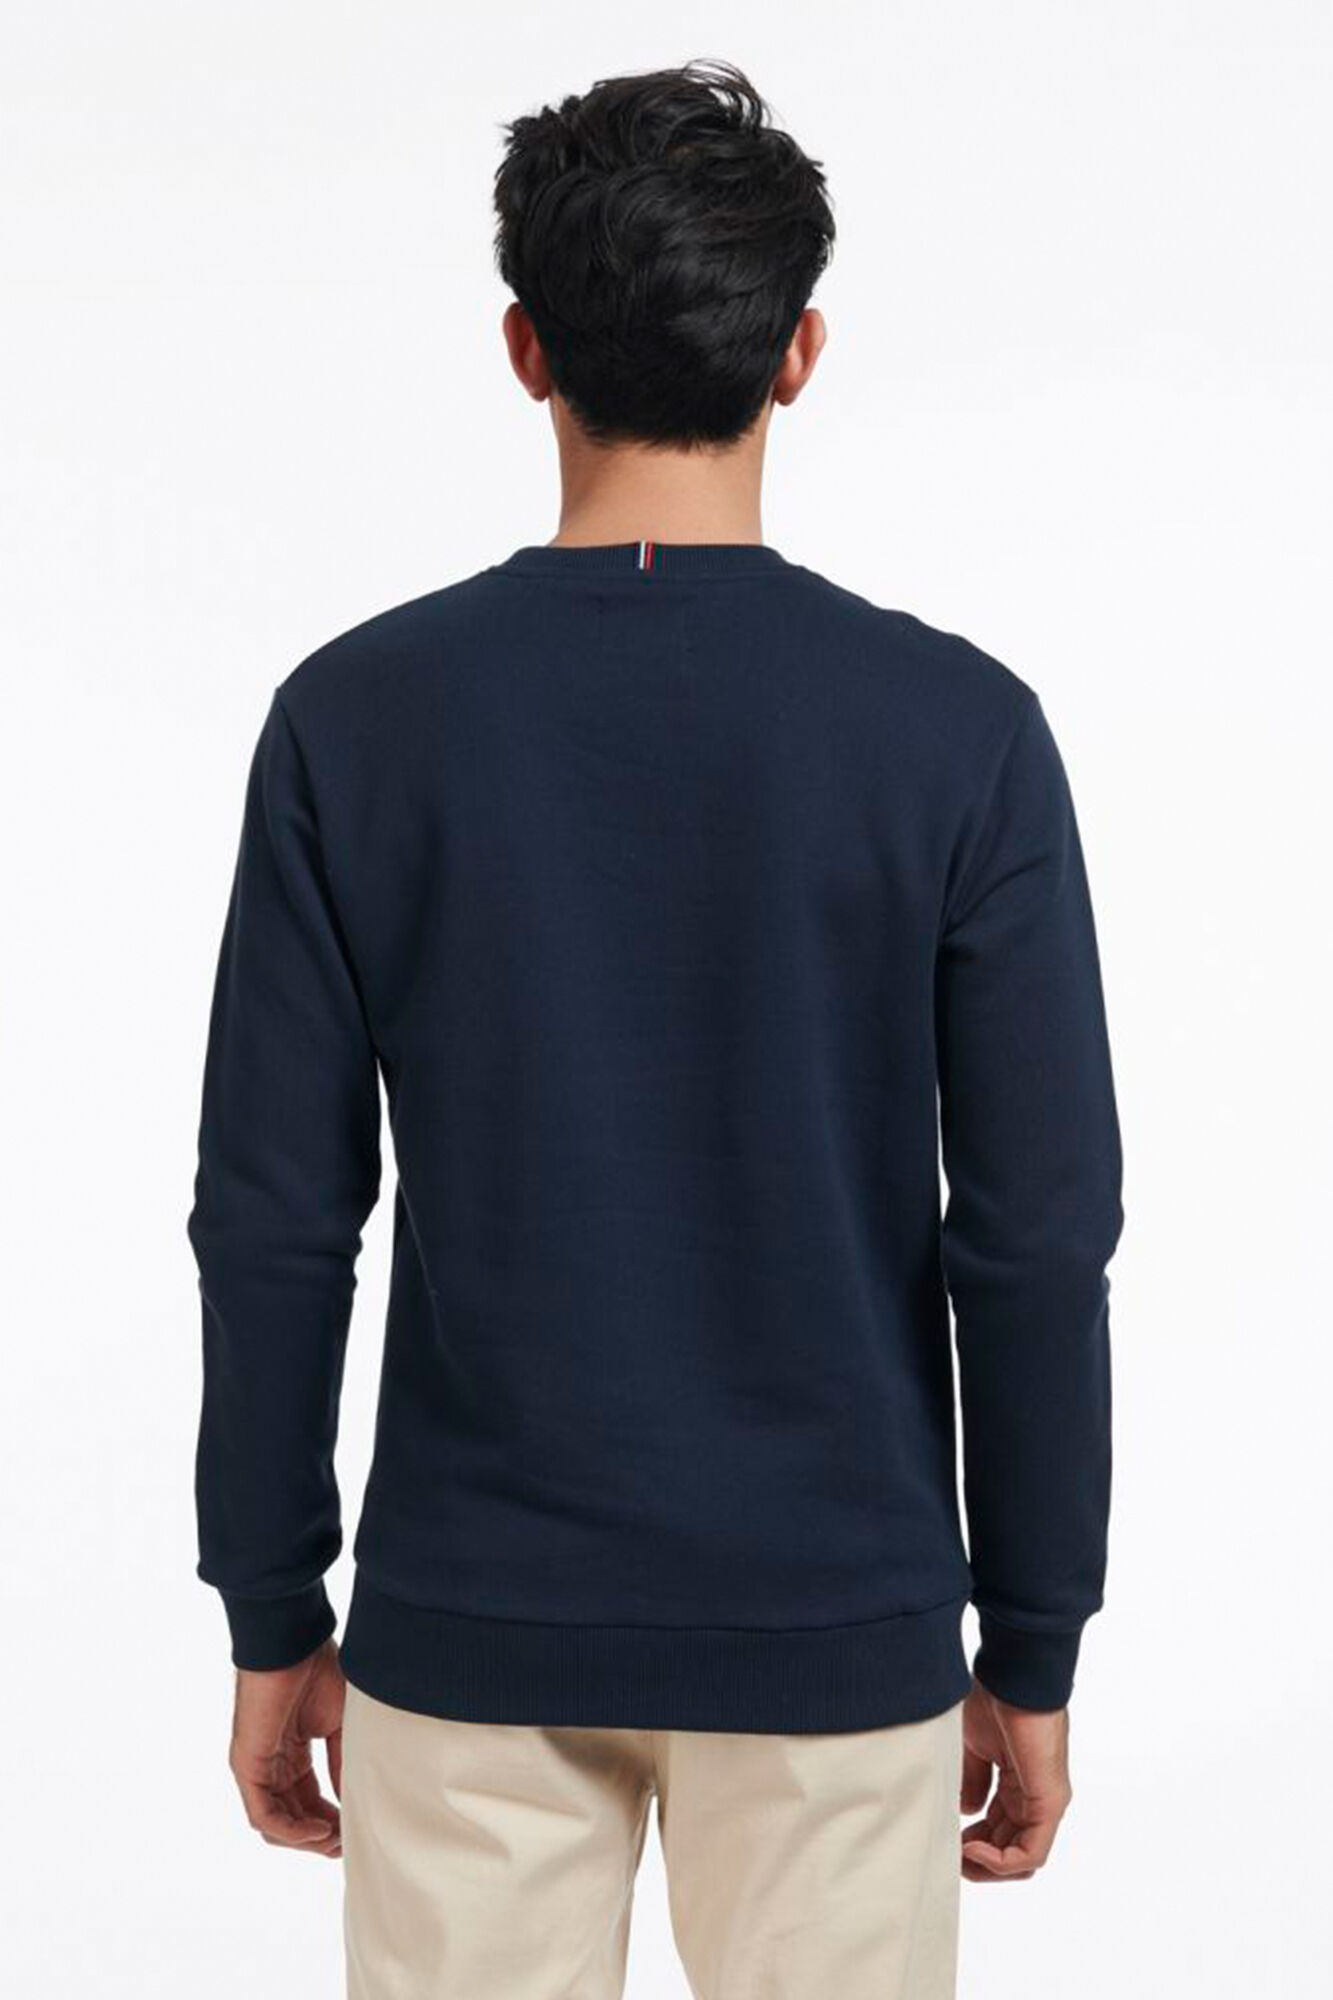 Leperie Sweatshirt LDM200036, DARK NAVY